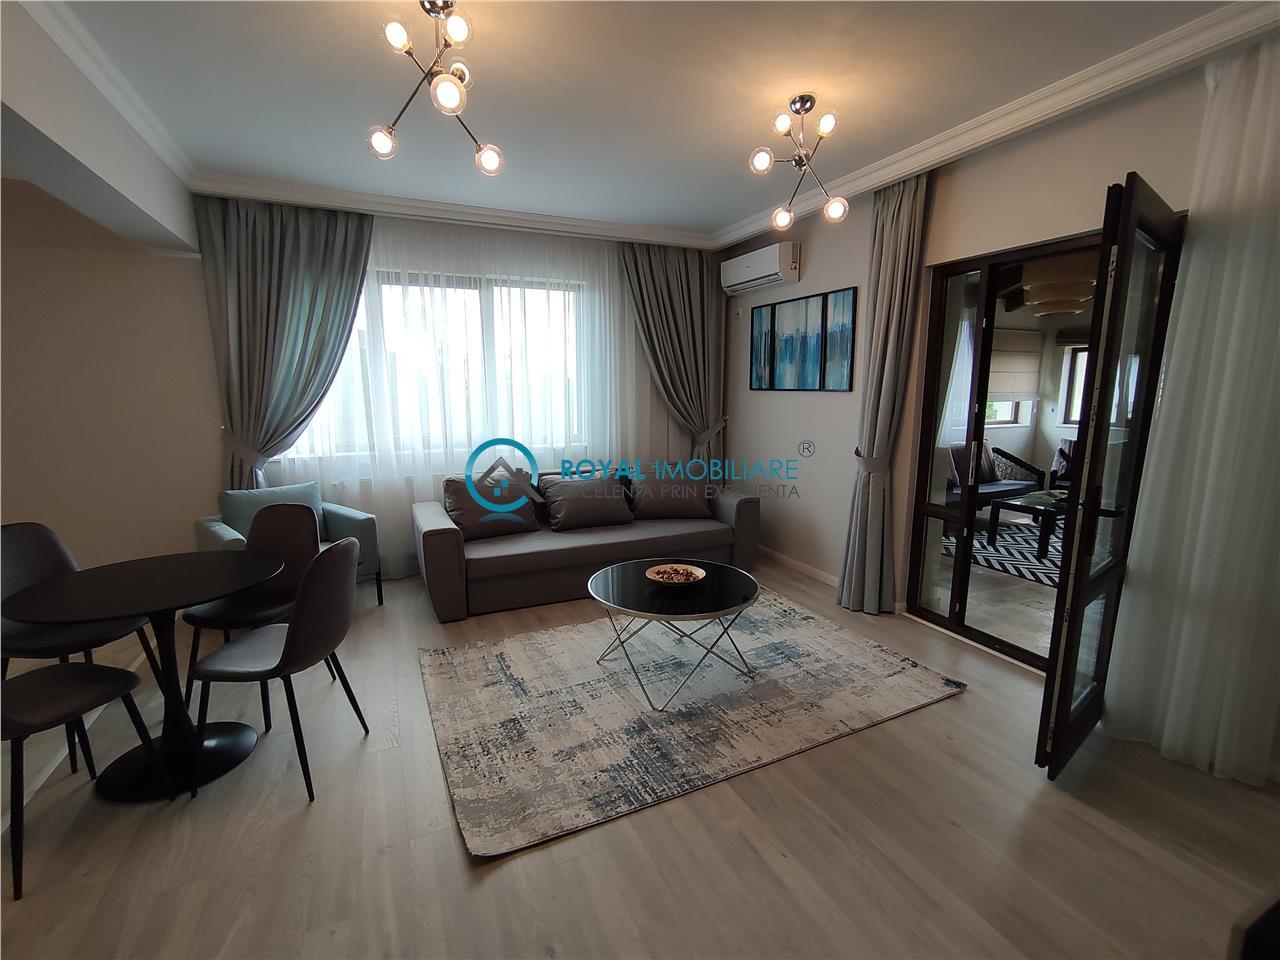 Royal Imobiliare   Inchiriere apartament de lux , bloc nou zona Albert